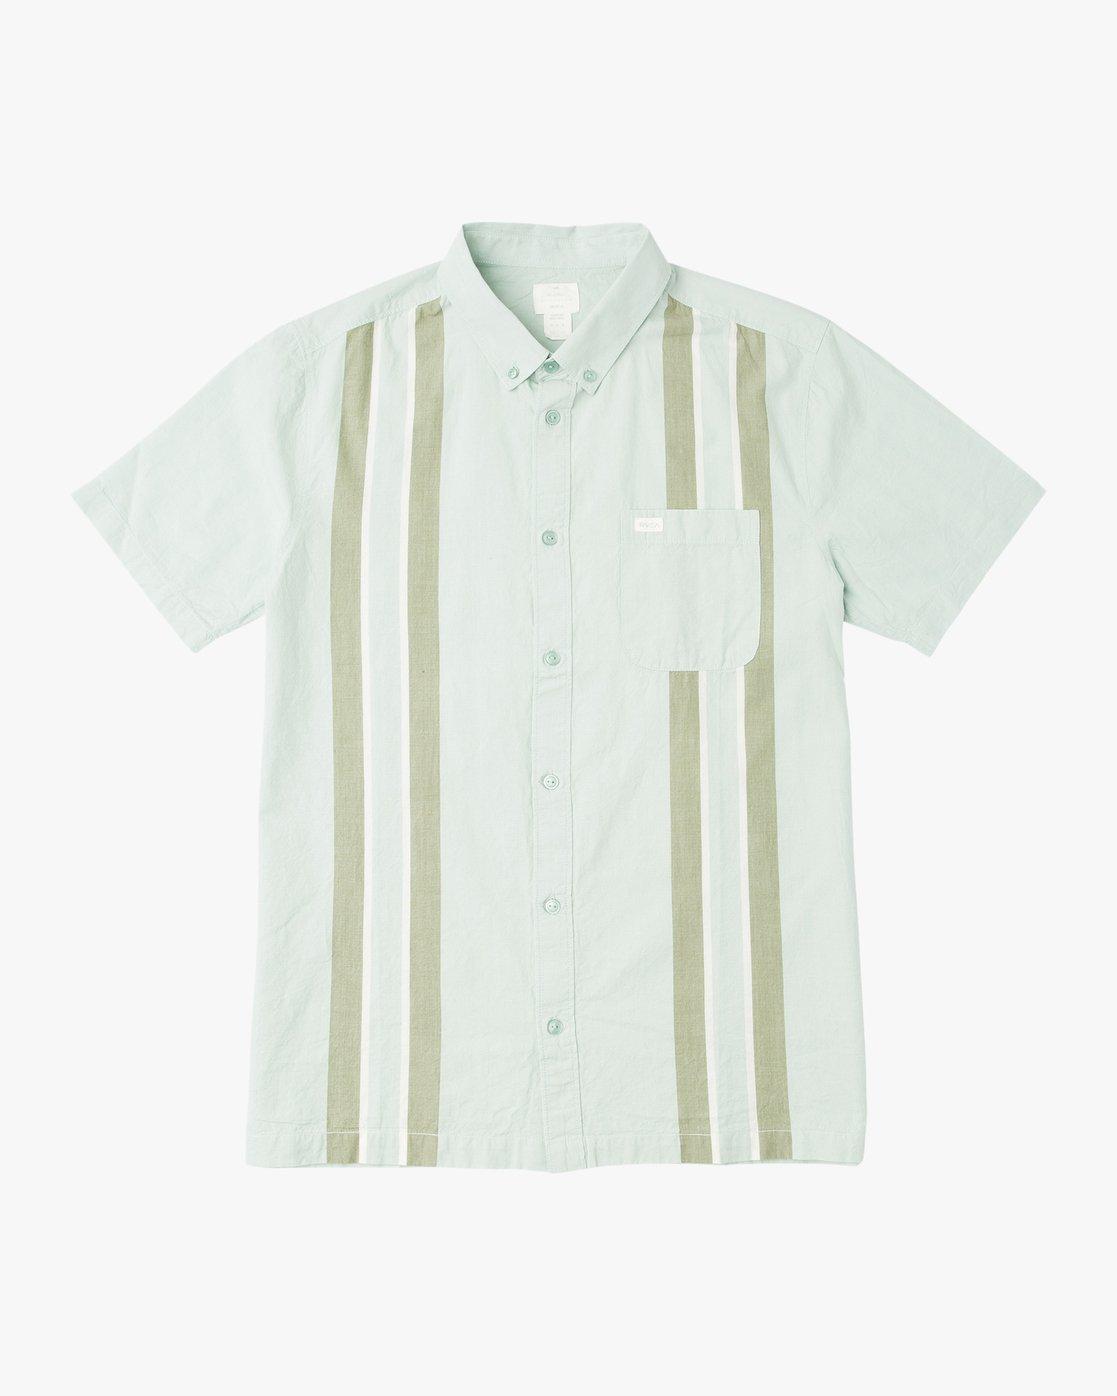 0 Neutral Havanna Button-Up Shirt Grey U501PRHA RVCA